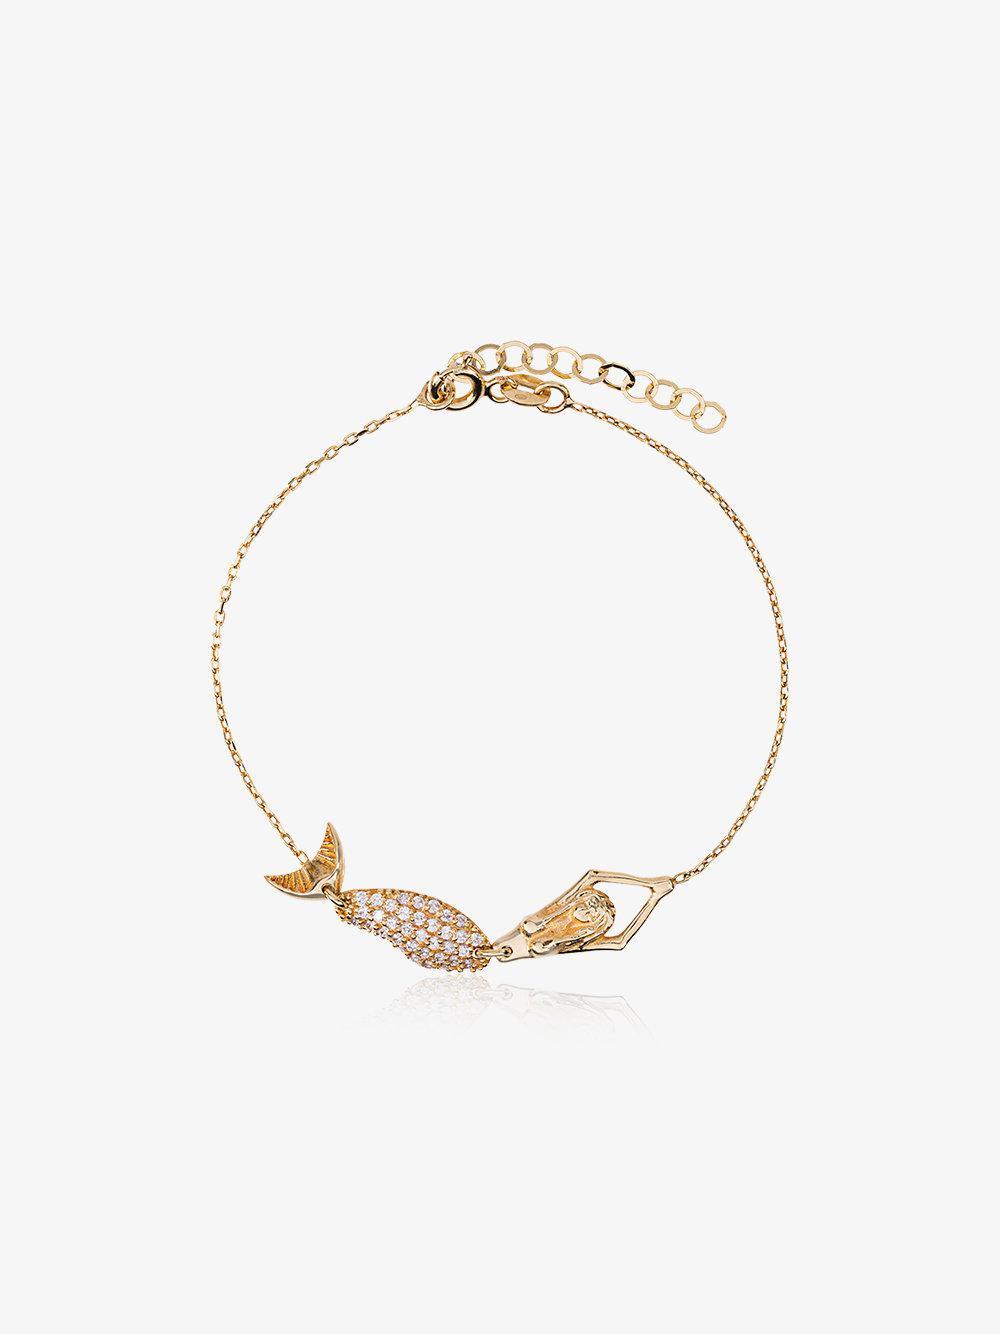 Anton Heunis 18k yellow gold mermaid diamond bracelet - Metallic szoTWO8J2R